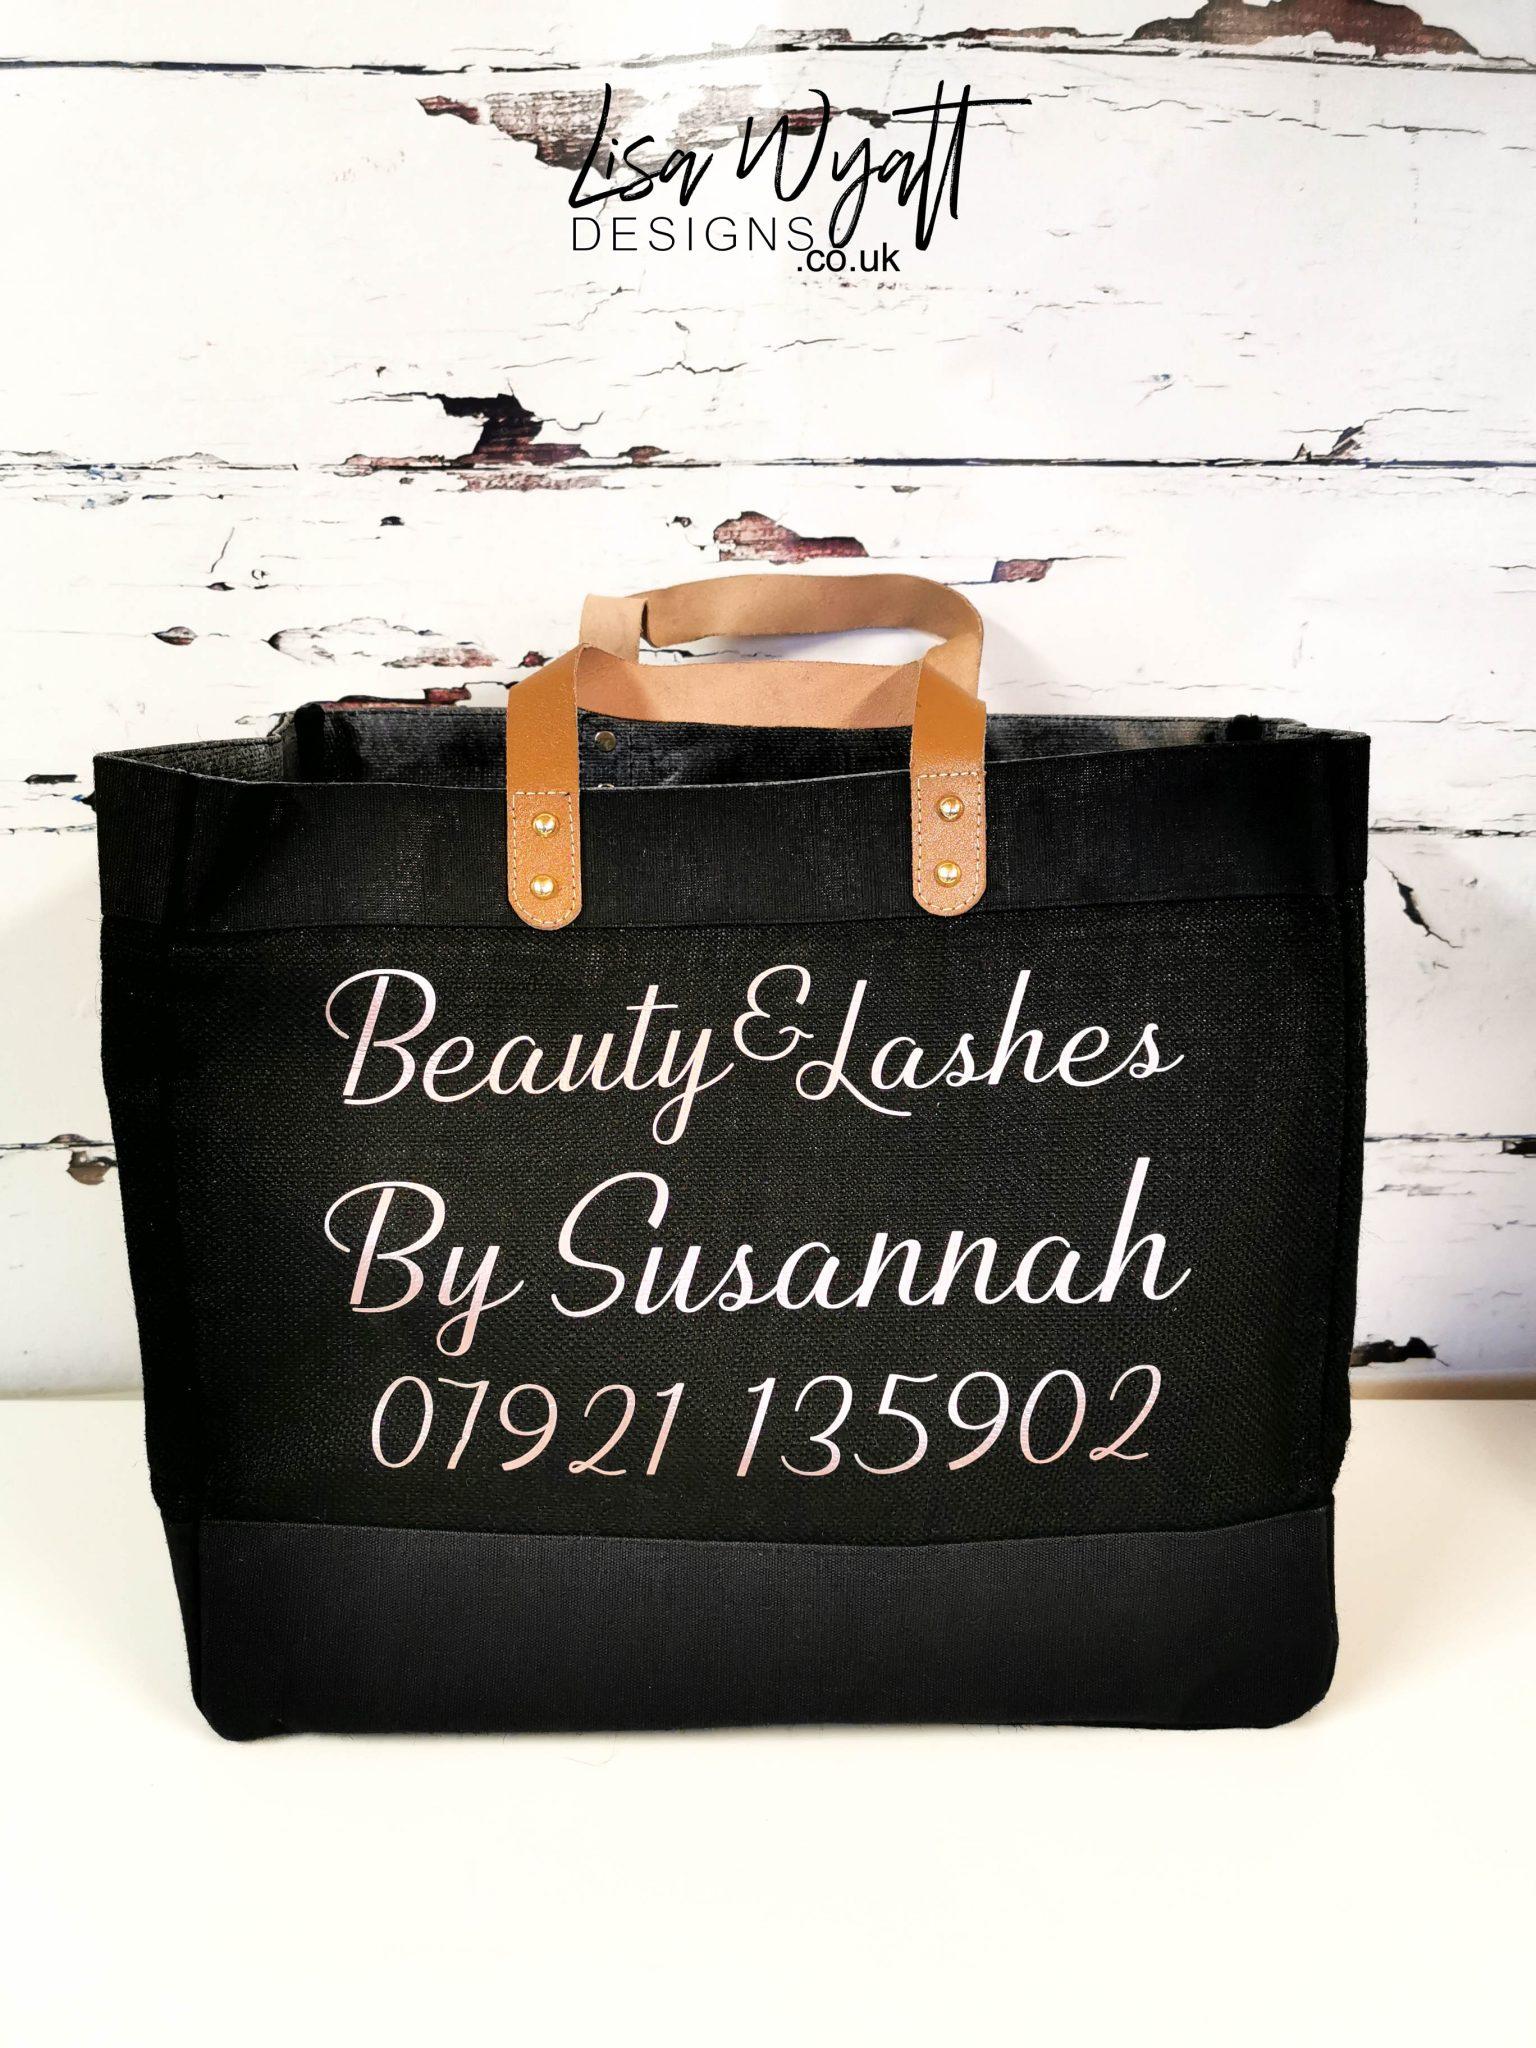 Luxury Large Leather Handle Jute Tote Branded Bag Black